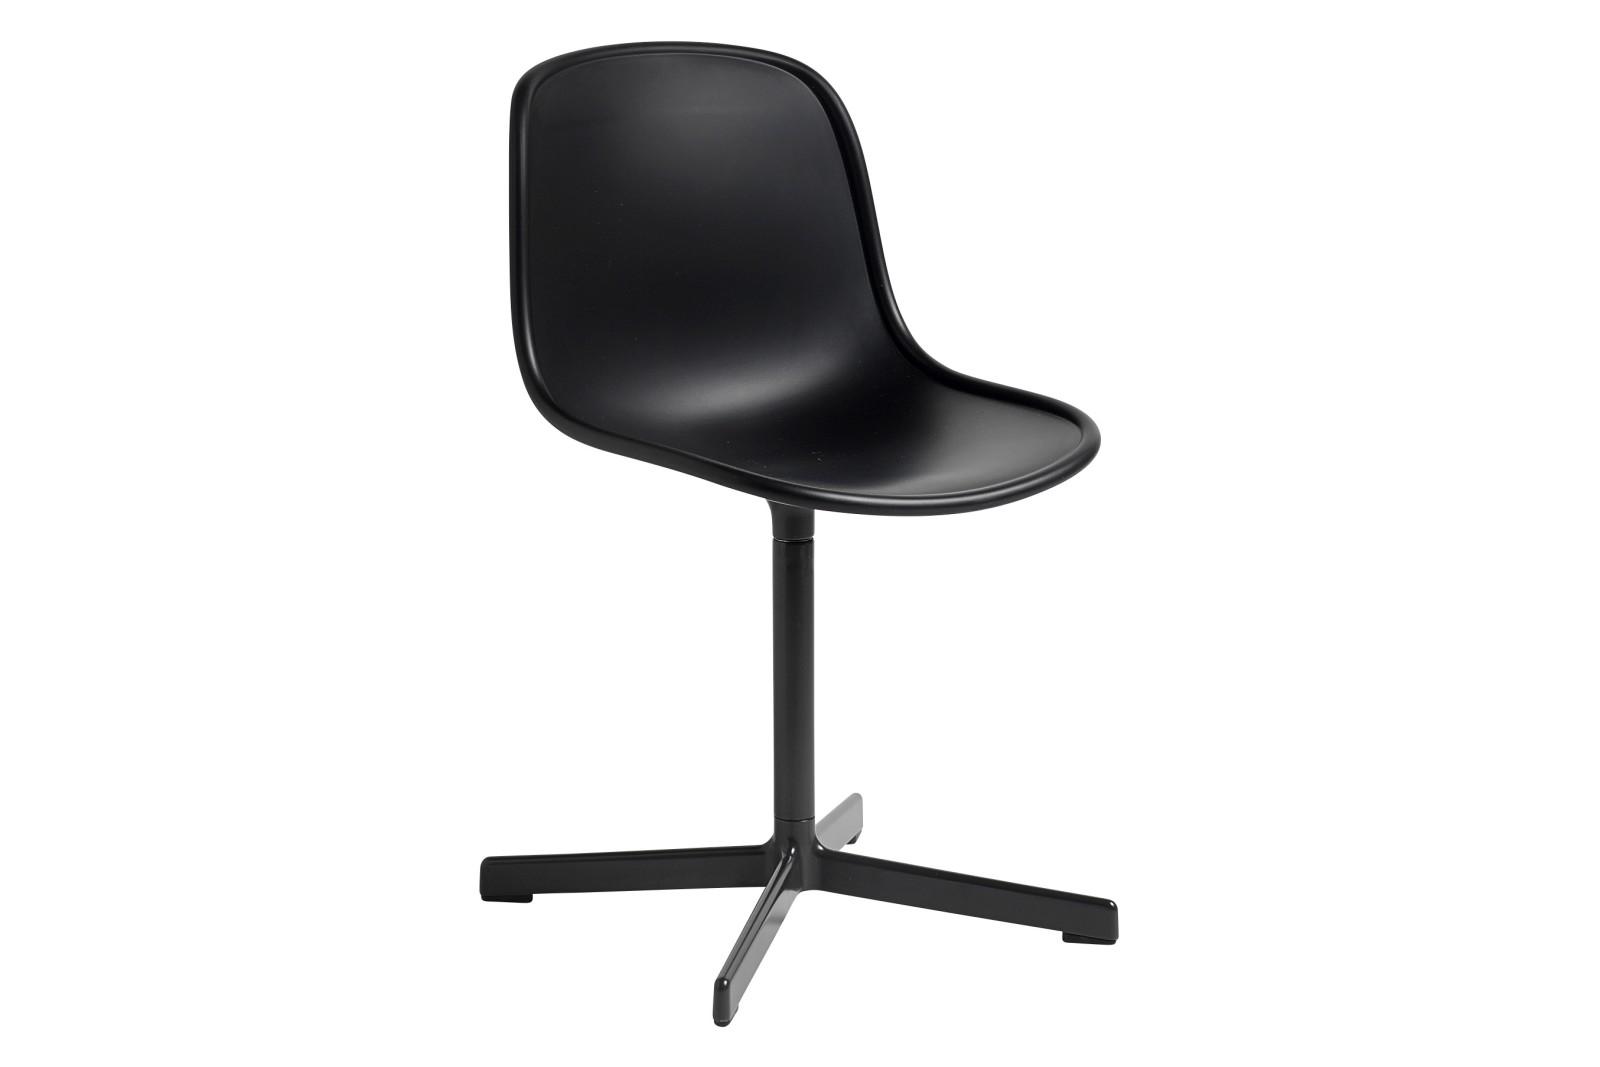 Neu 10 Chair with Swivel Base Soft Black Shell, Soft Black Frame